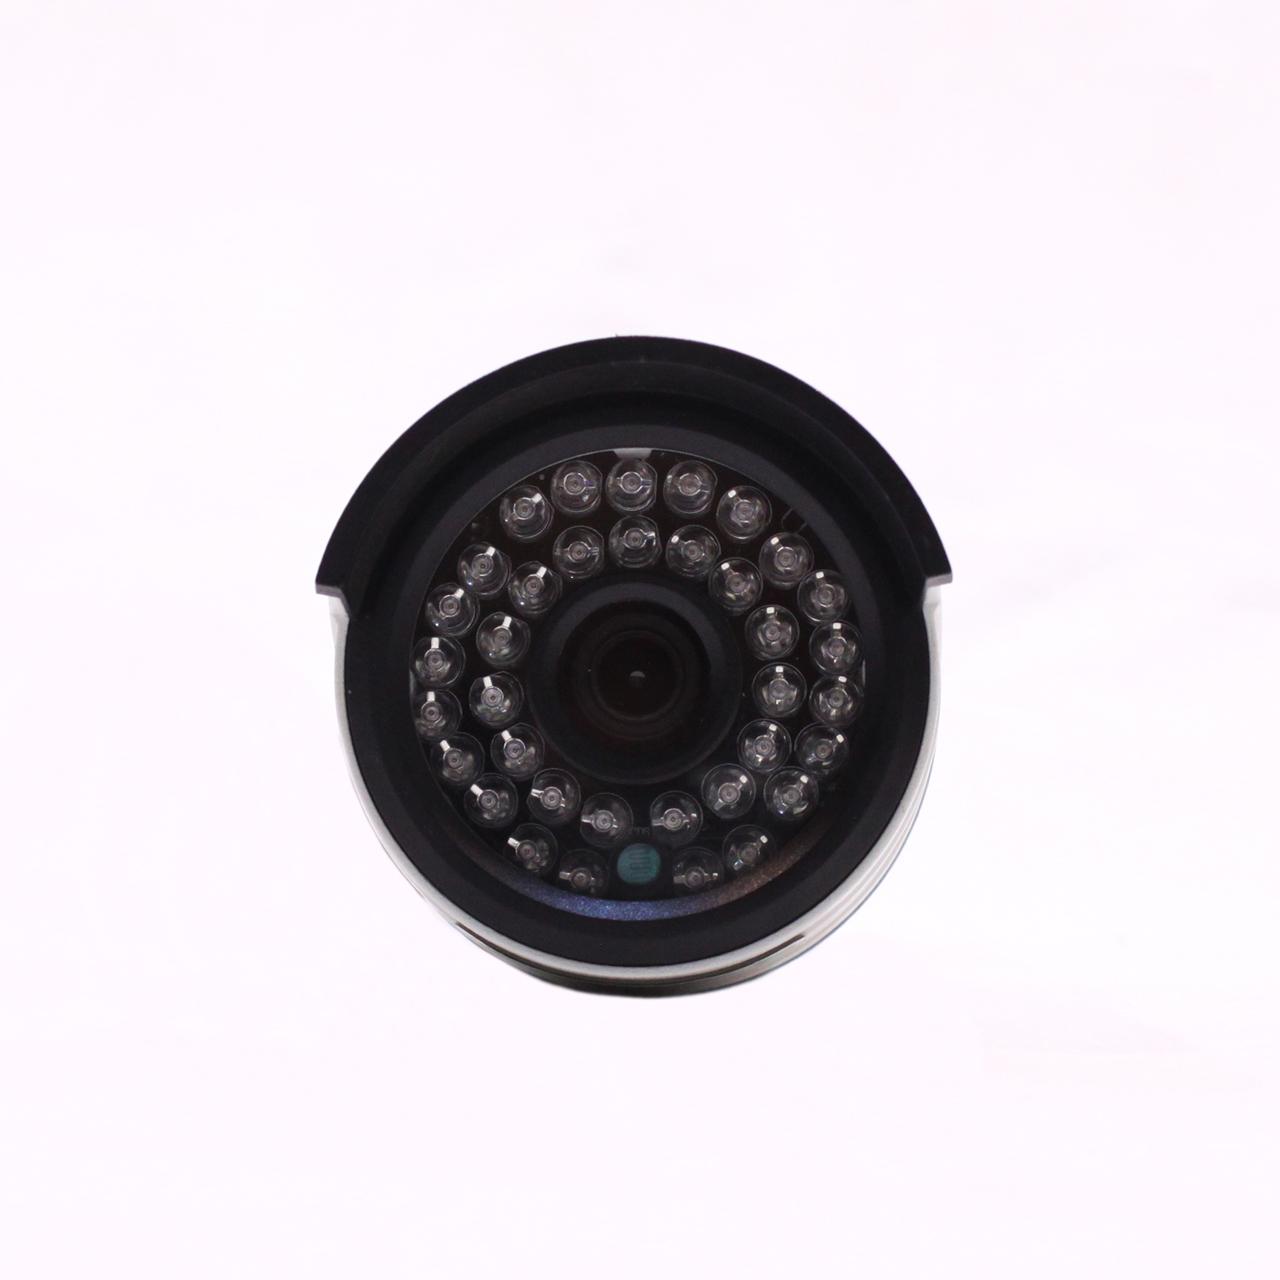 دوربین مداربسته هرویژن مدل QC-MX1520AOB AHD